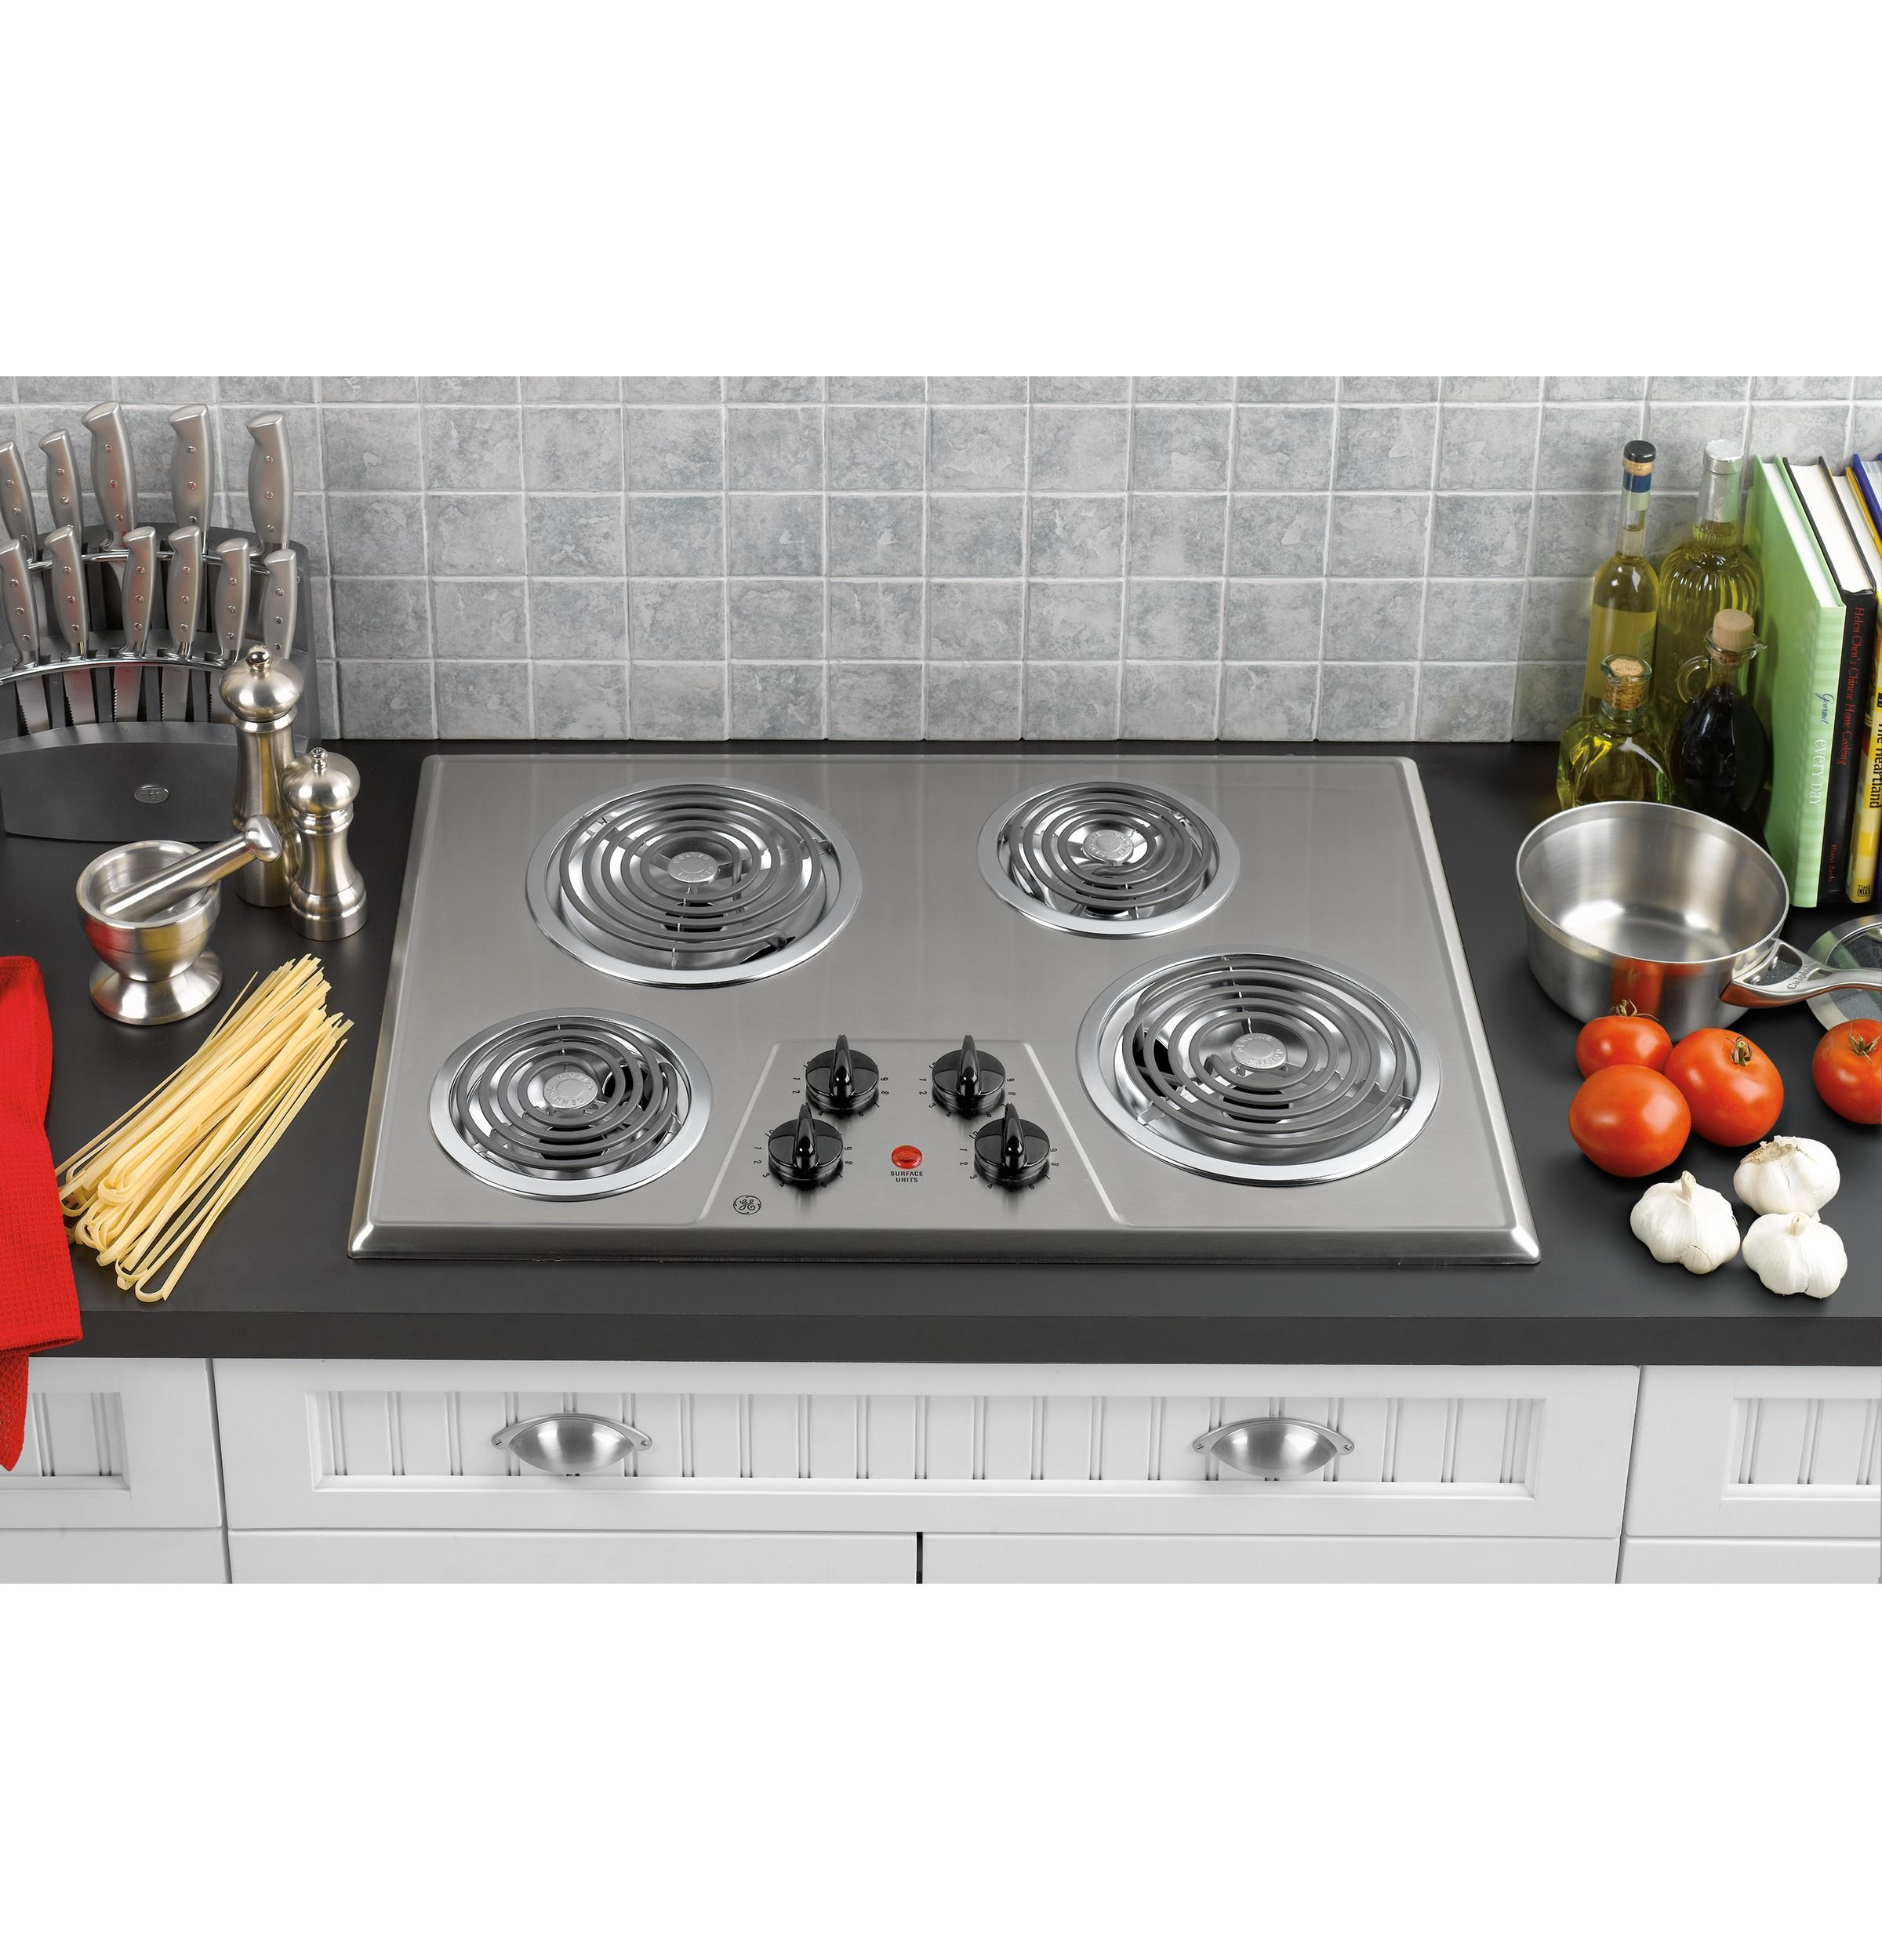 Jp328skss Ge 30 Built In Electric Cooktop Ge Appliances Electric Cooktop Cooktop Stainless Steel Kitchen